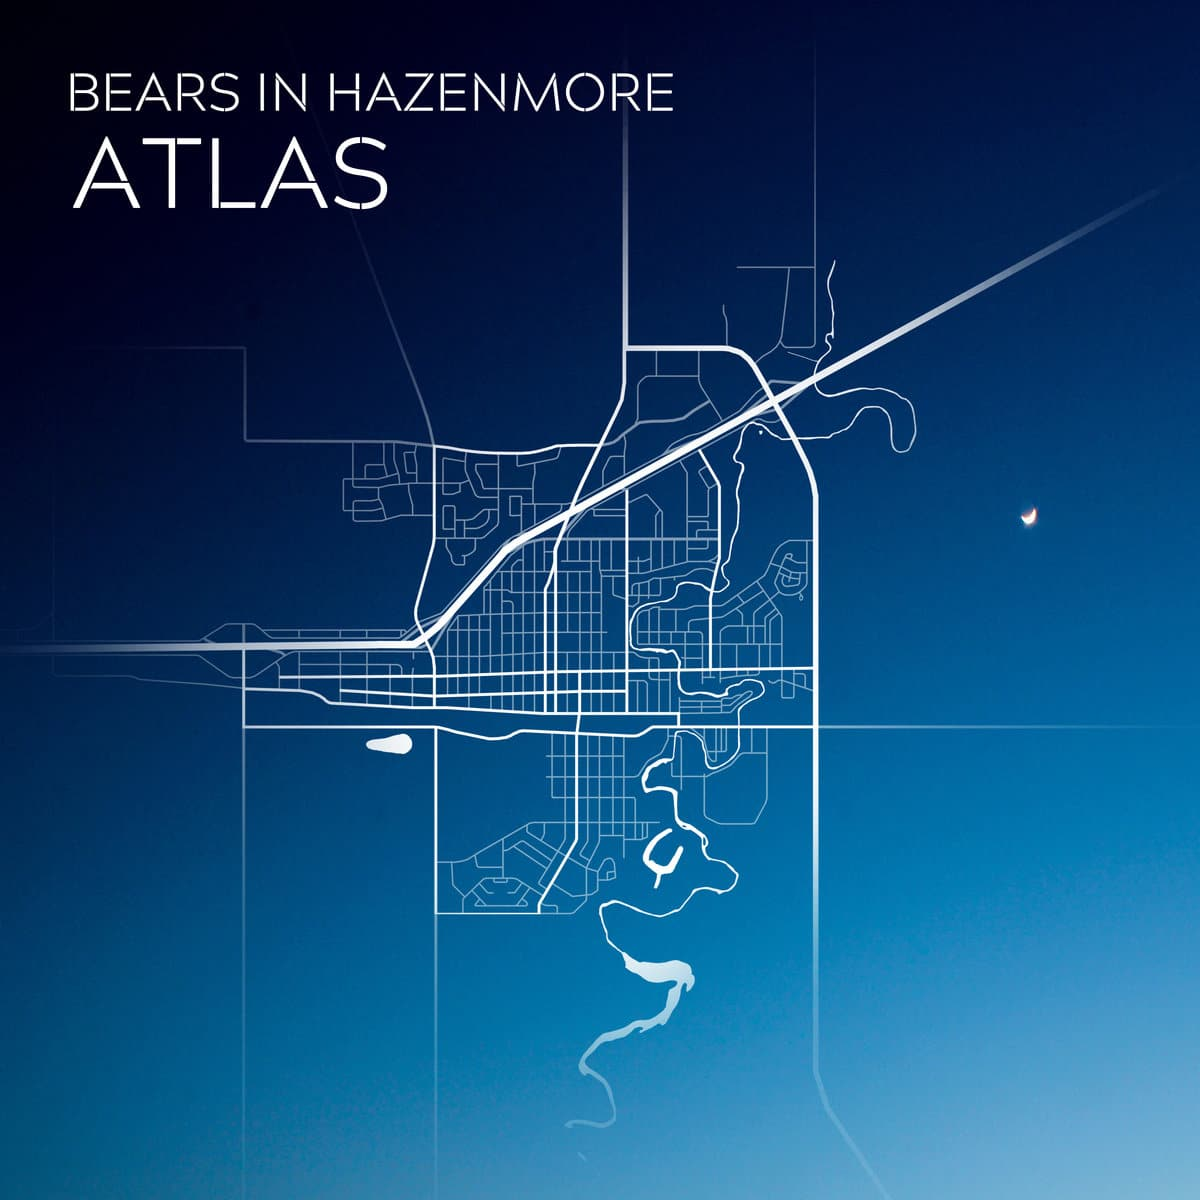 bears in hazenmore